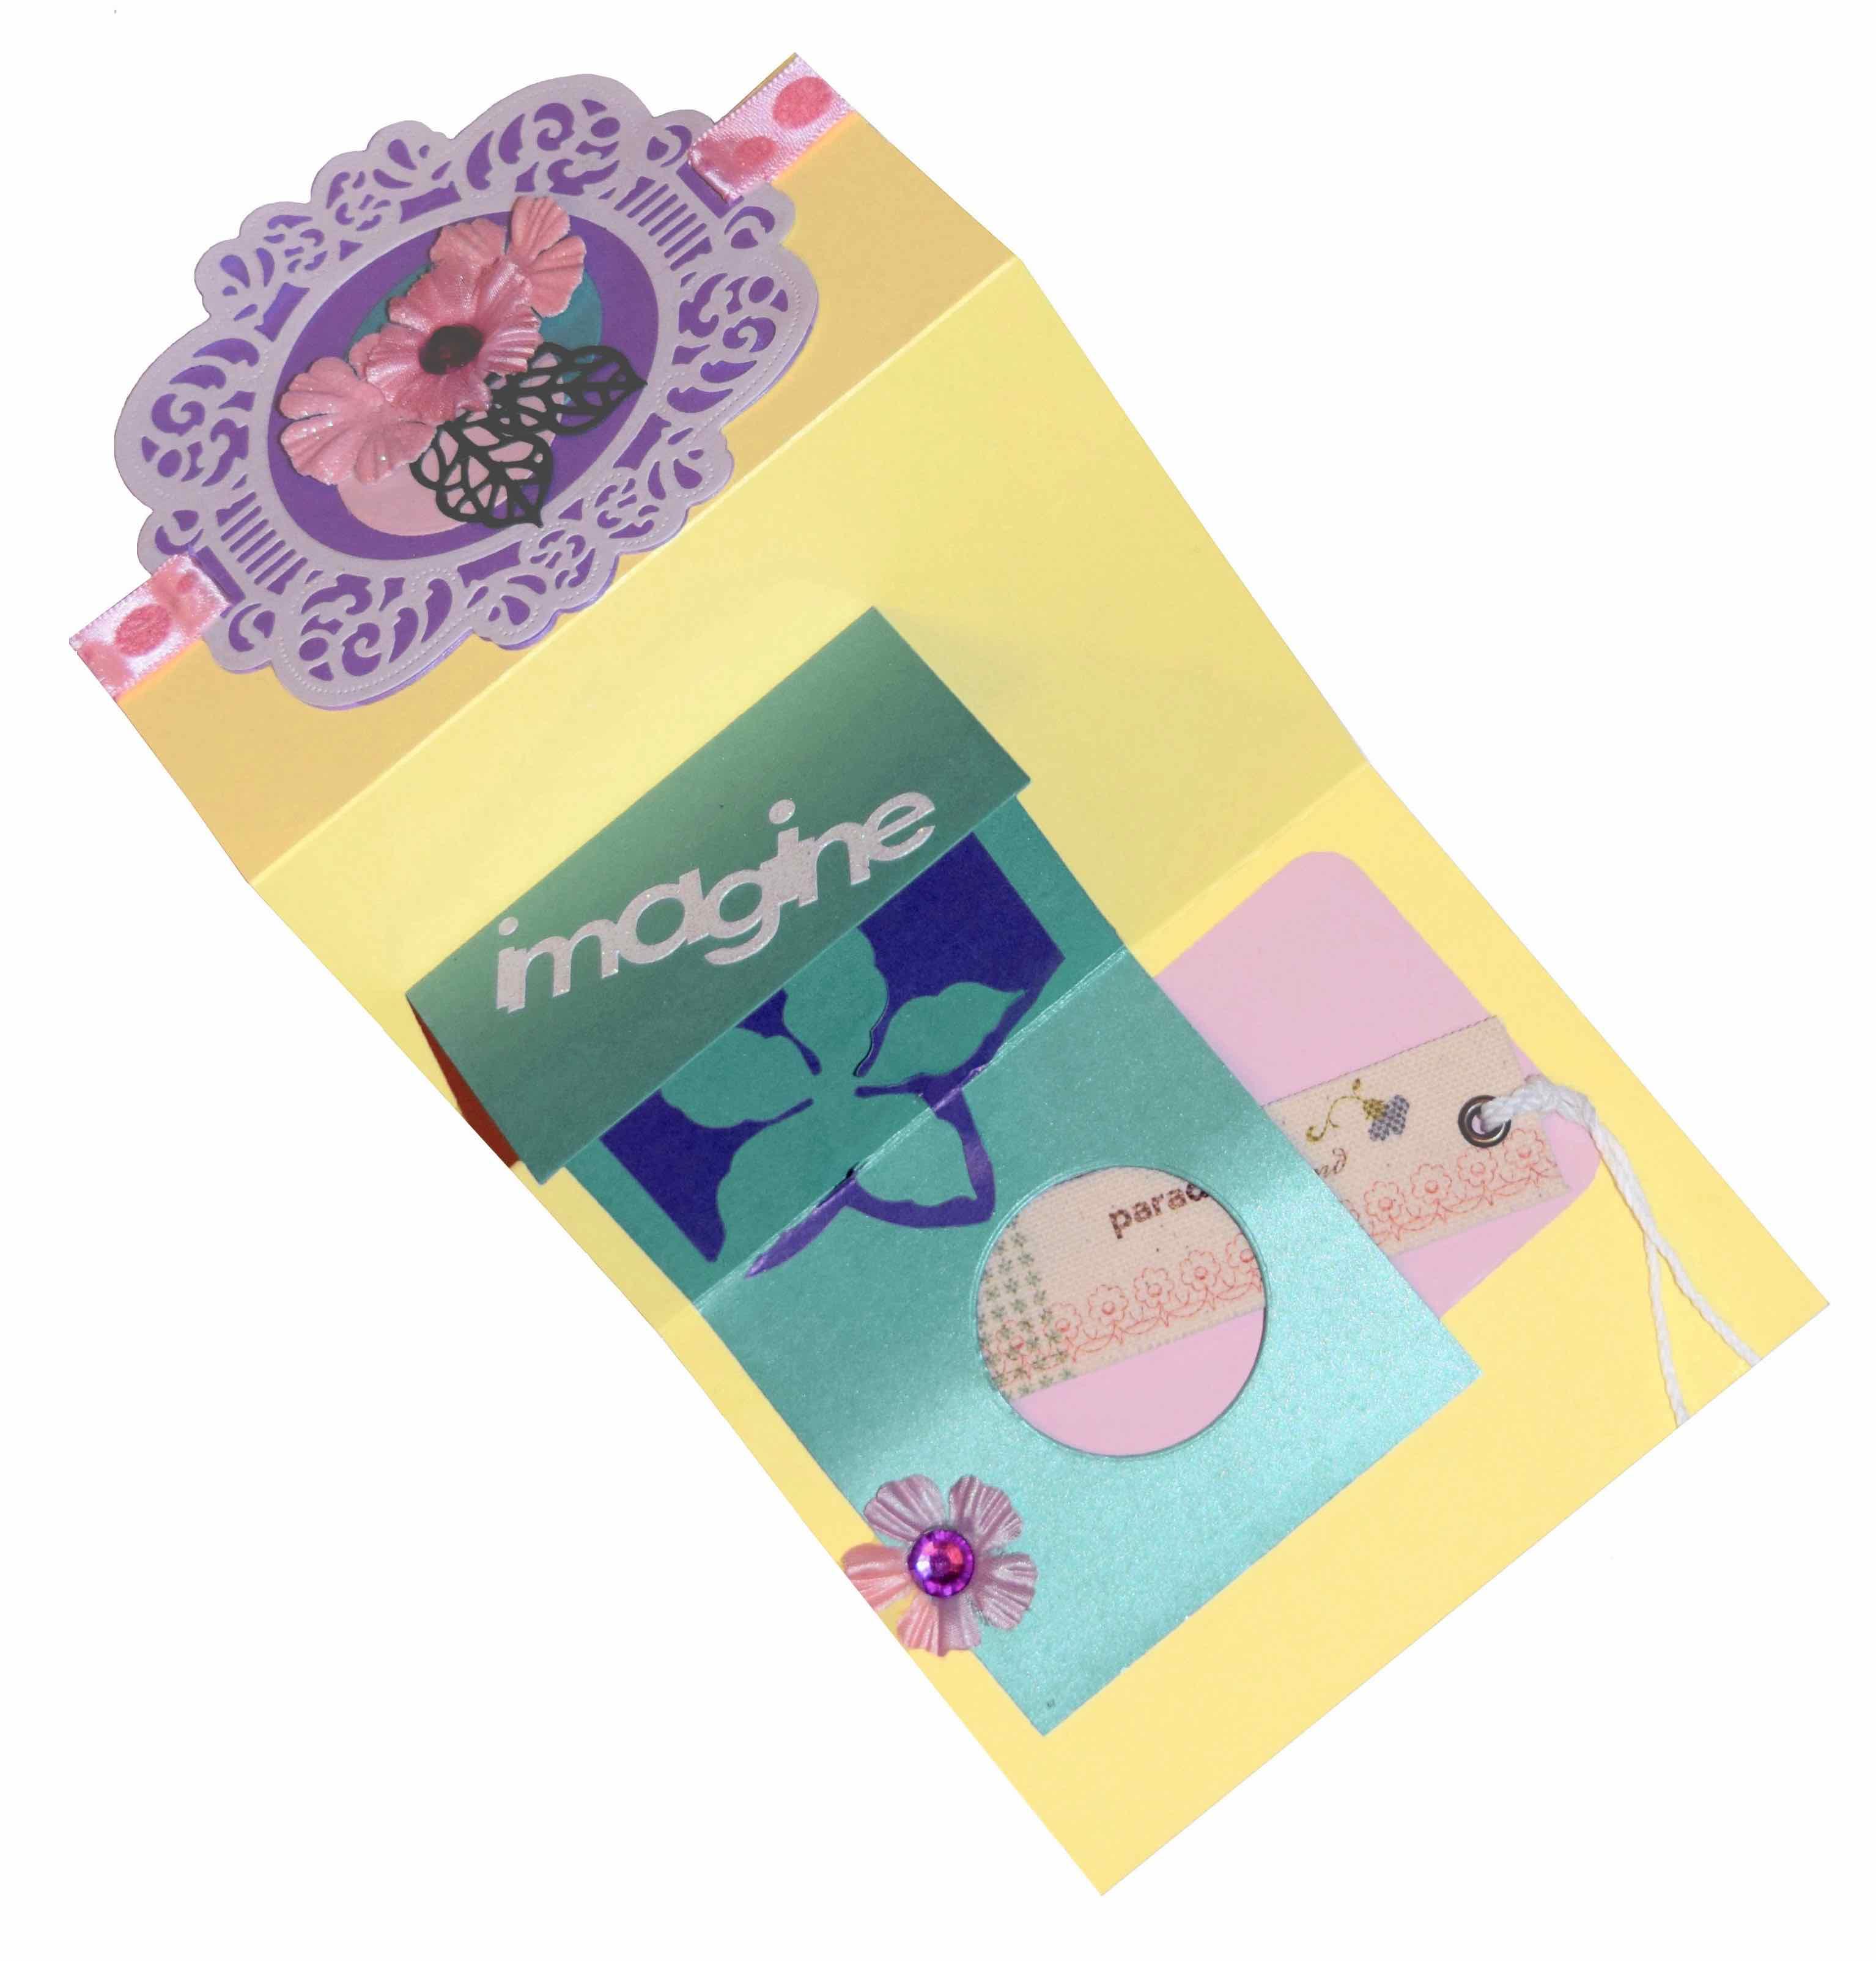 spring flower trifold pocket card - Paper Papers Trifold Opened 1a Original a - Spring Flower Trifold Pocket Card